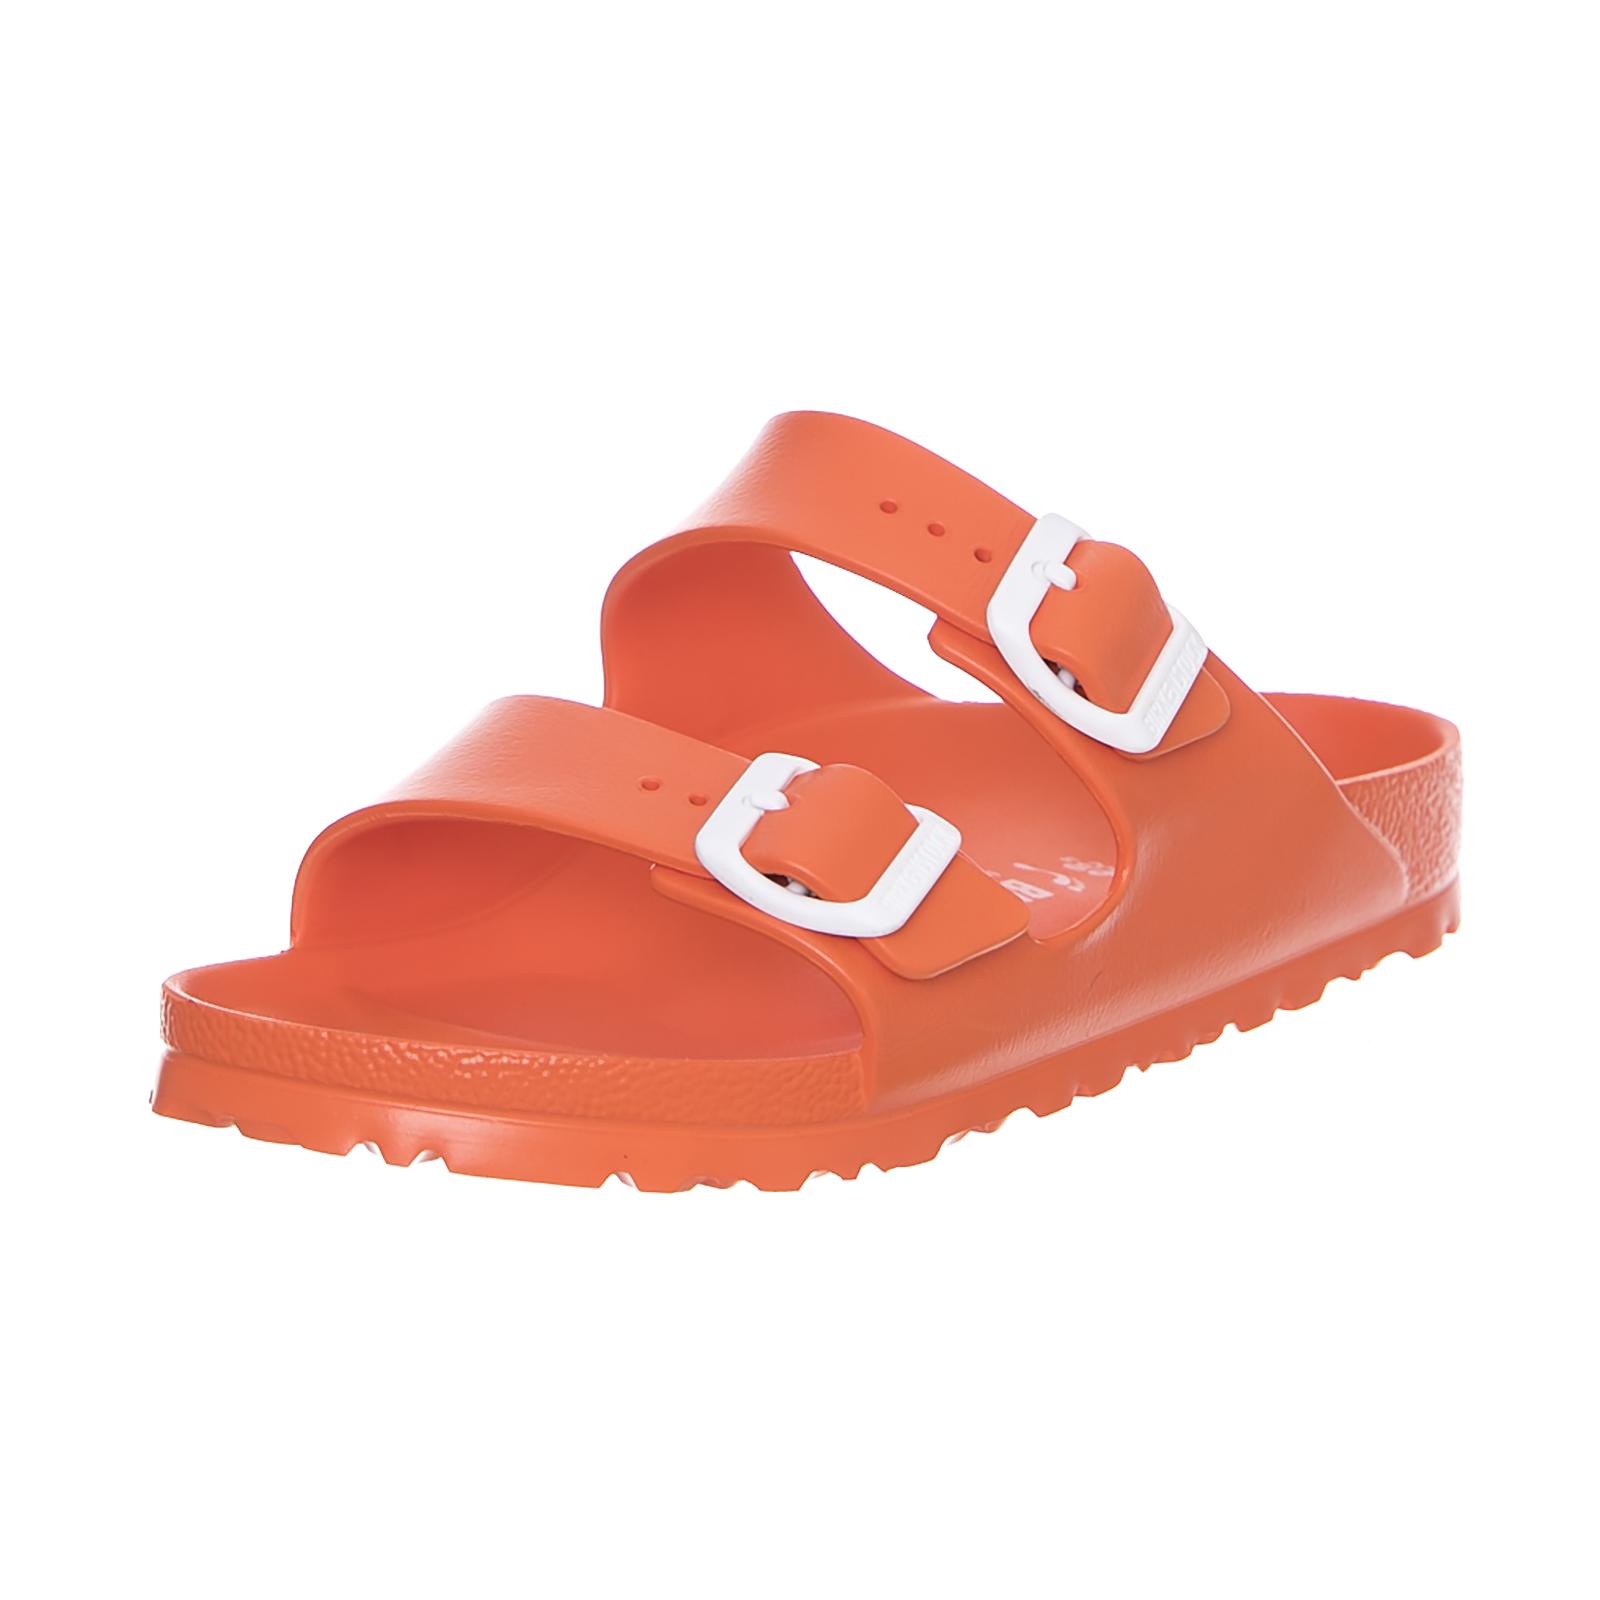 eb40fa87020 Birkenstock Sandals Arizona Eva Scuba Coral Narrow Fit Orange